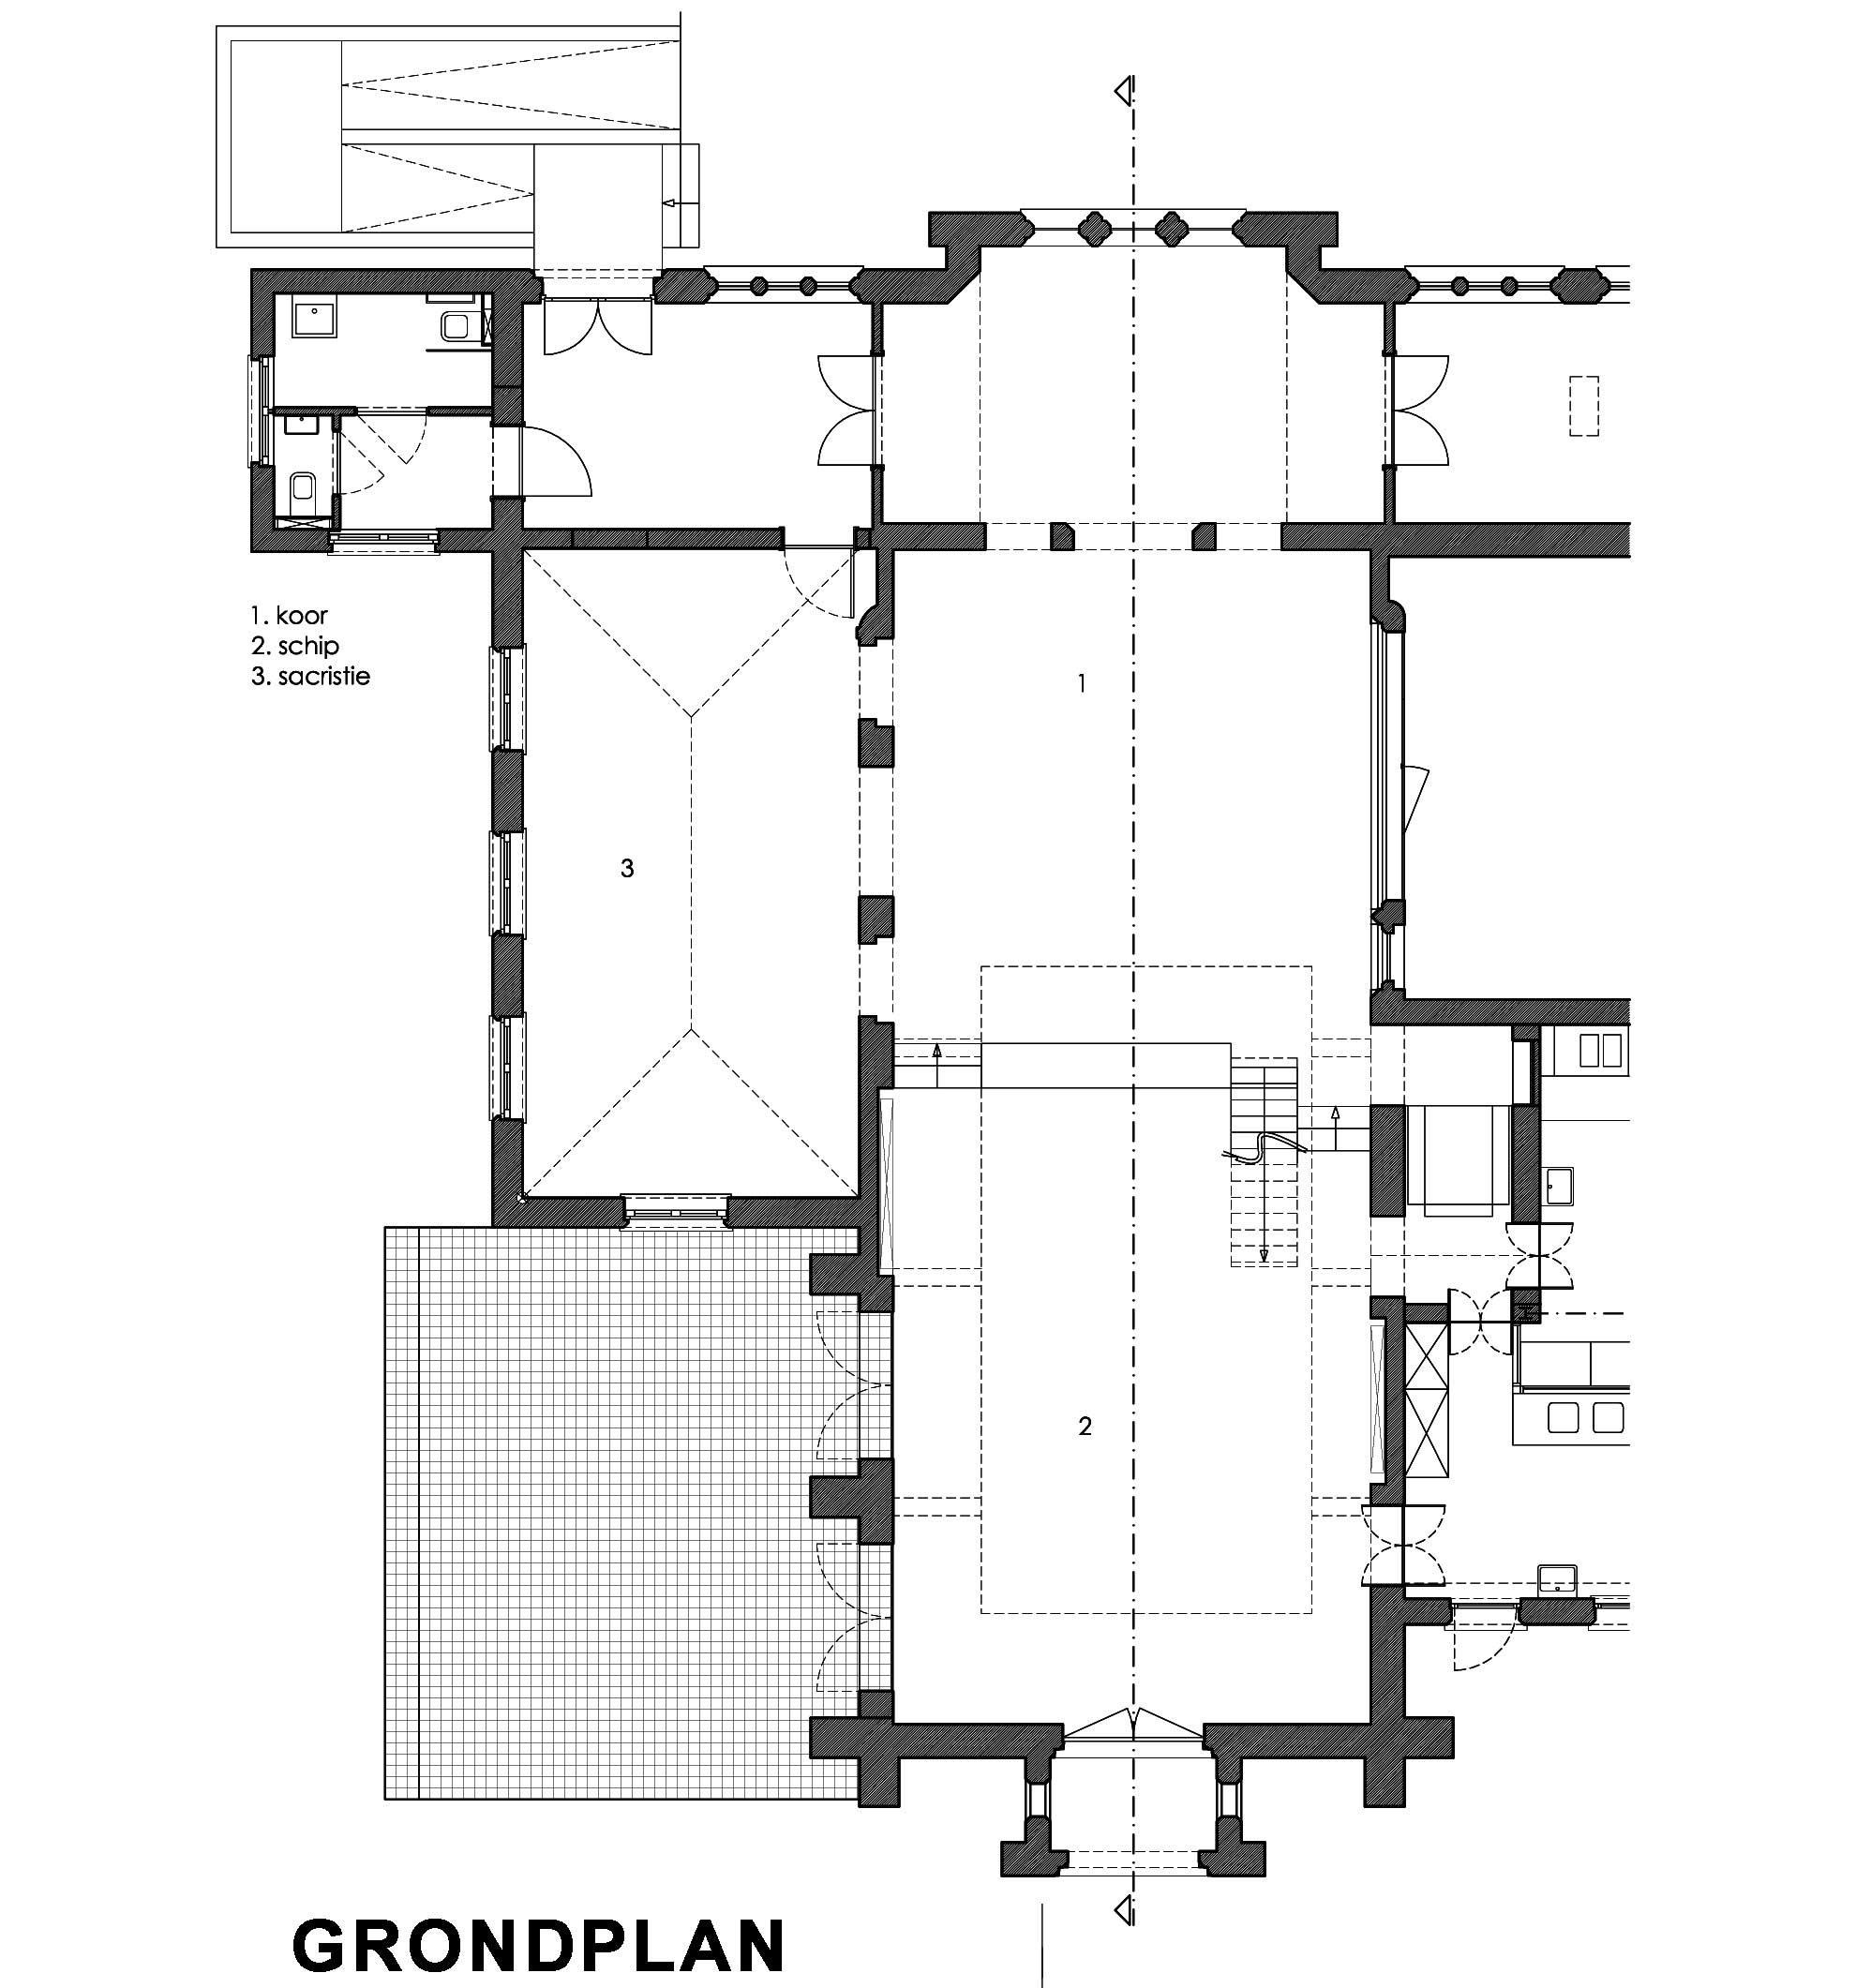 Grondplan renovatie Karmel Brugge AVDK Architecten